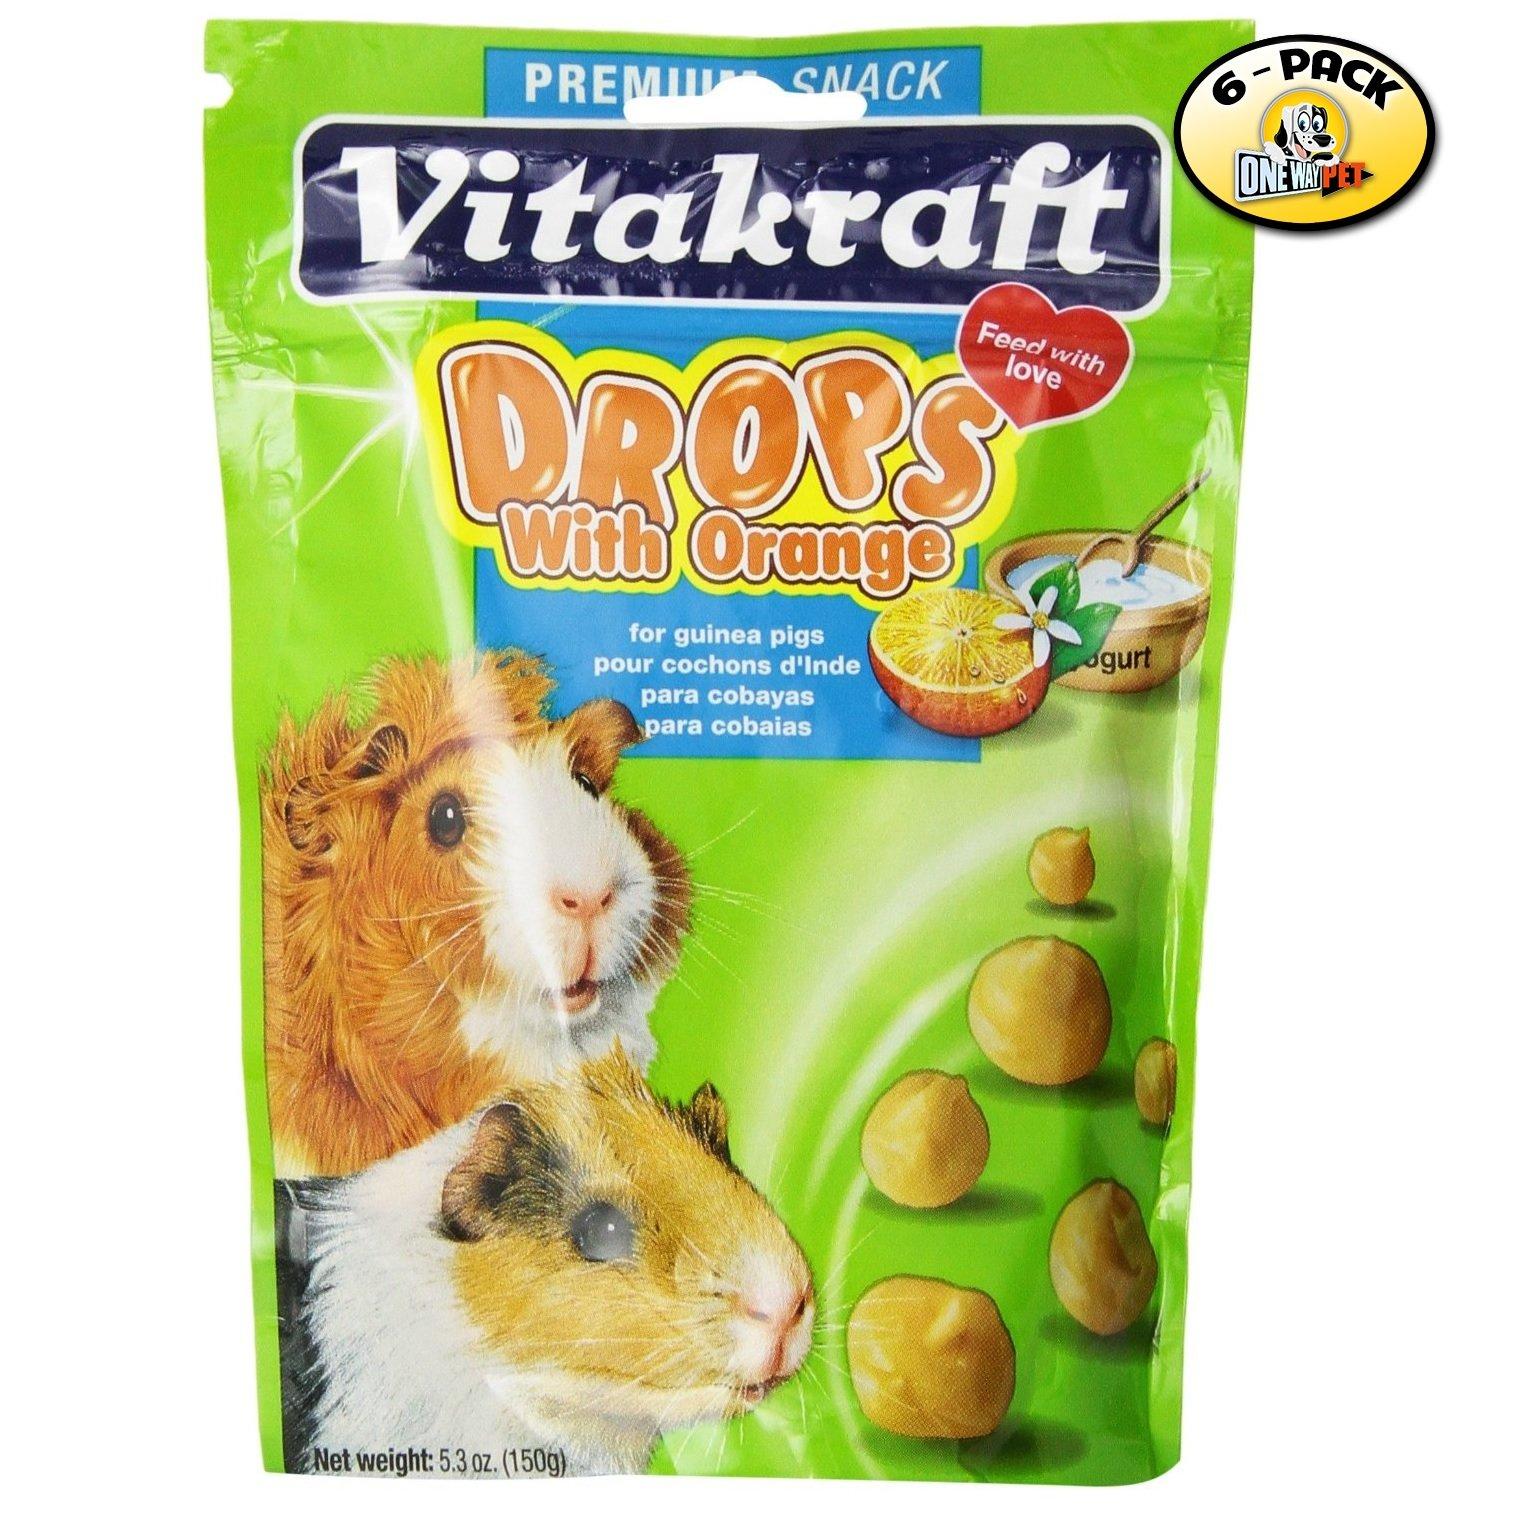 Vitakraft Guinea Pig Orange Drops Treats - 6 PACK